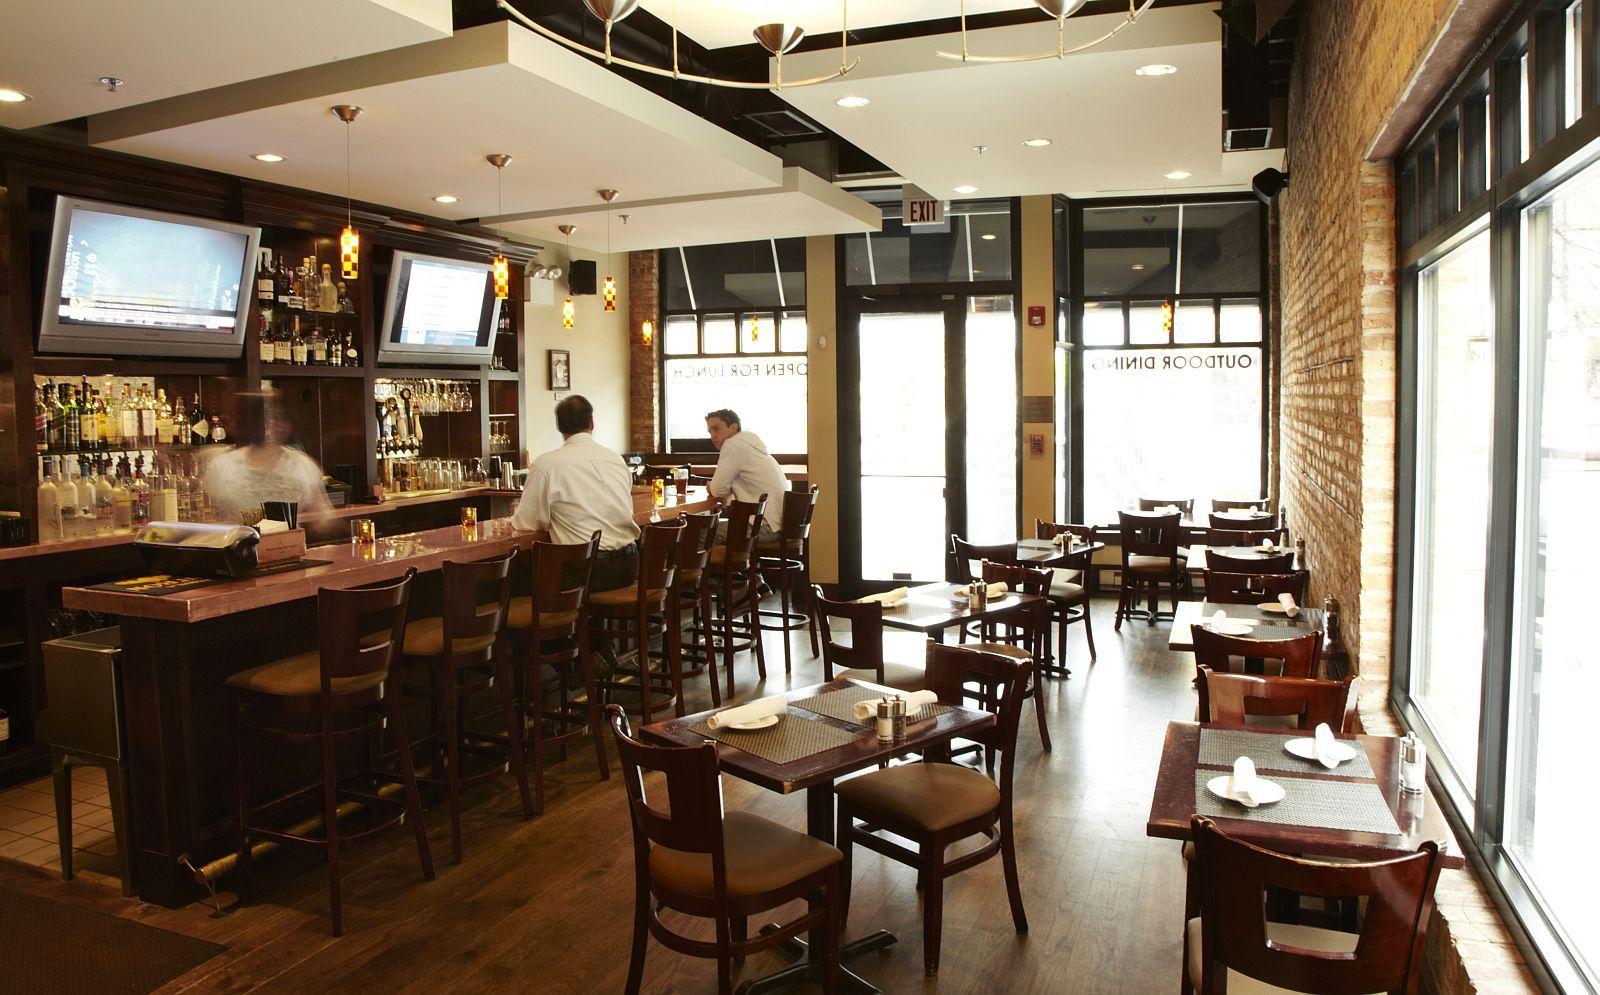 545 North Restaurant Dining Room Libertyville